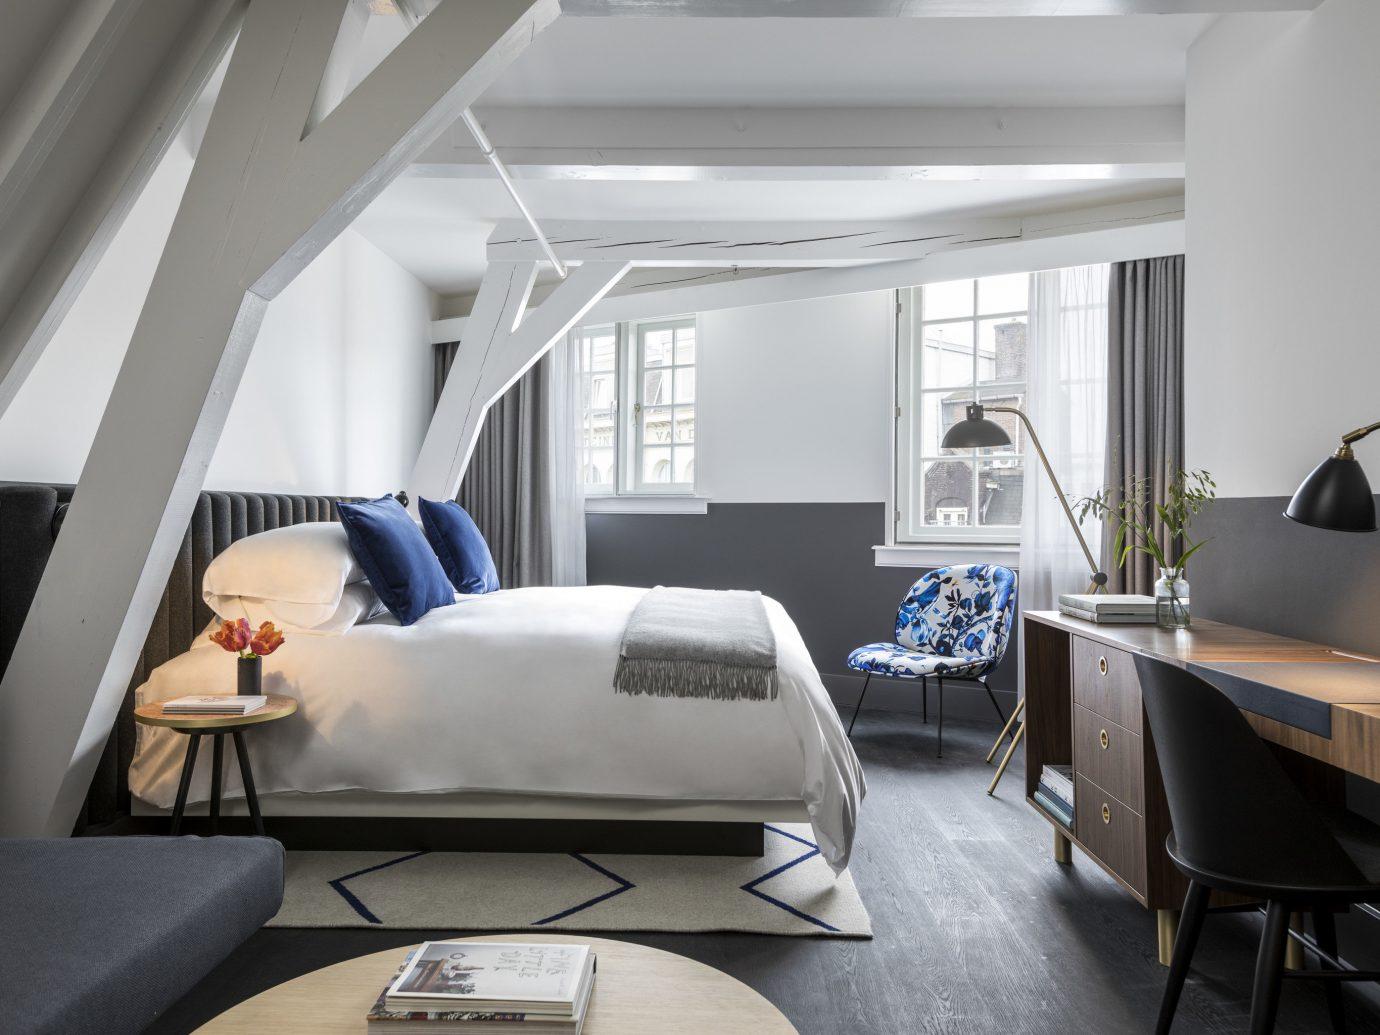 Amsterdam Hotels The Netherlands indoor wall floor room window Architecture interior design ceiling furniture white product design Bedroom loft Suite daylighting interior designer